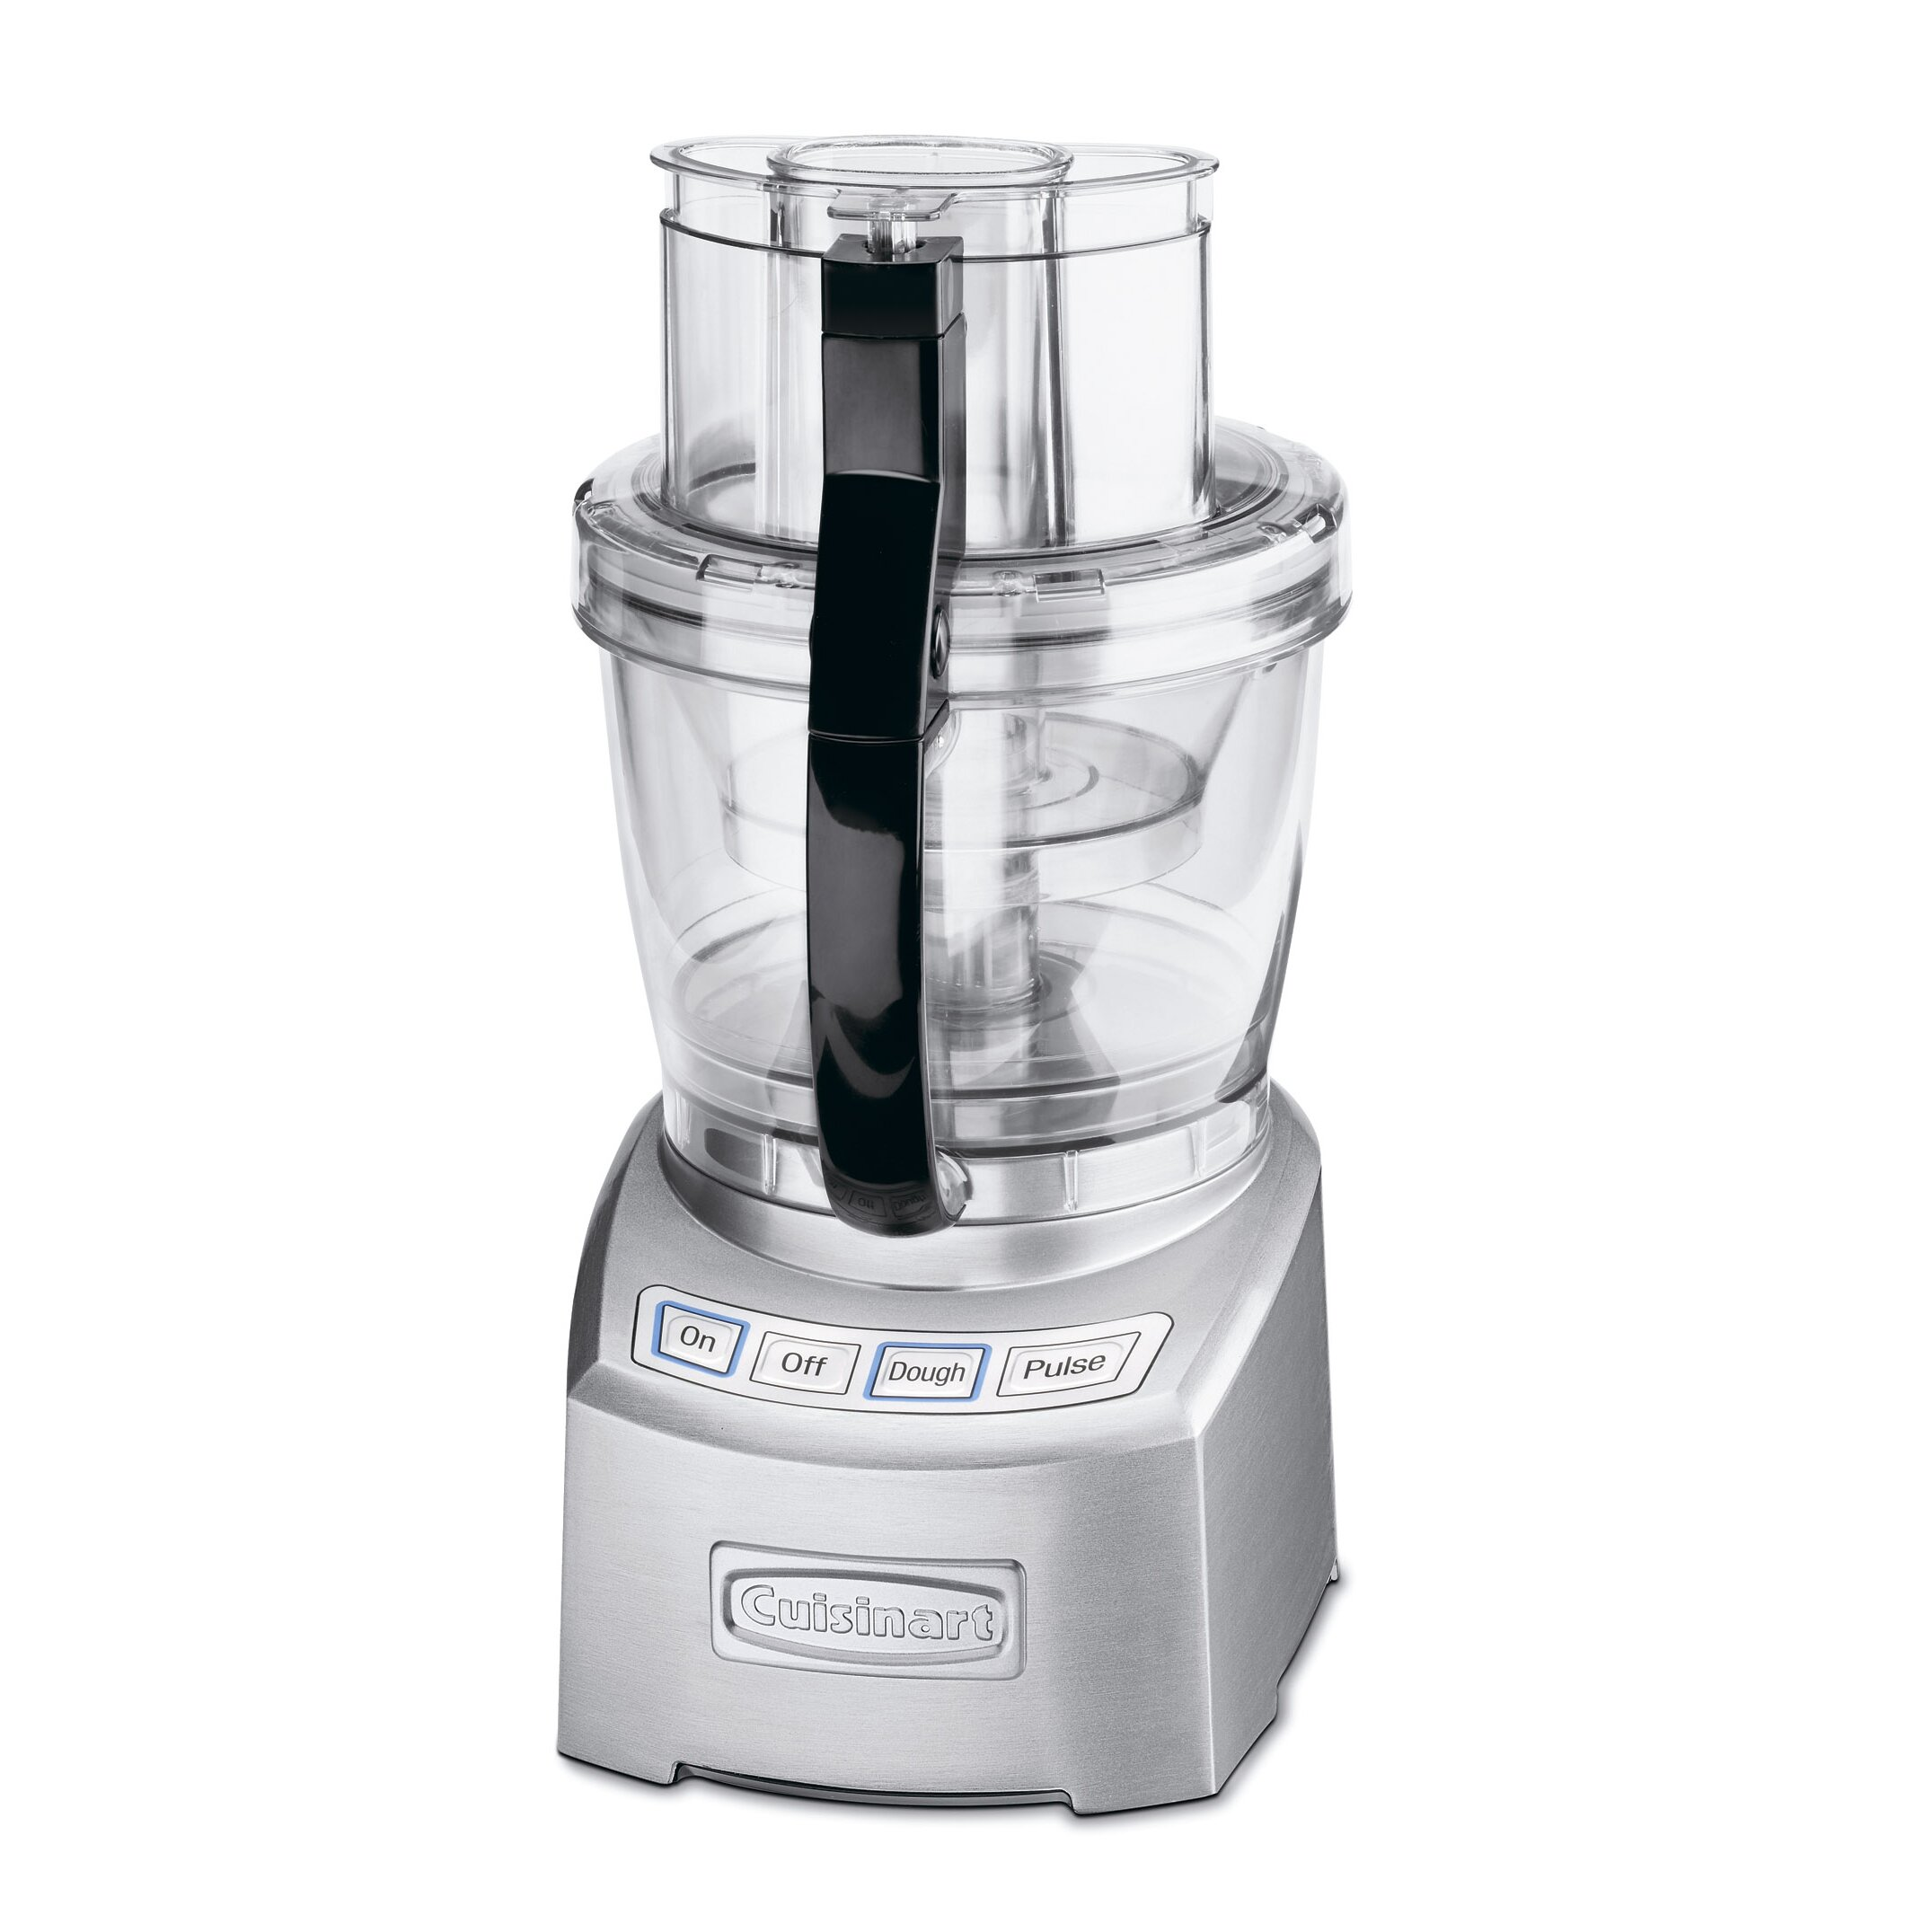 Cuisinart smartpower duet blender and food processor - 14 Cup Food Processor